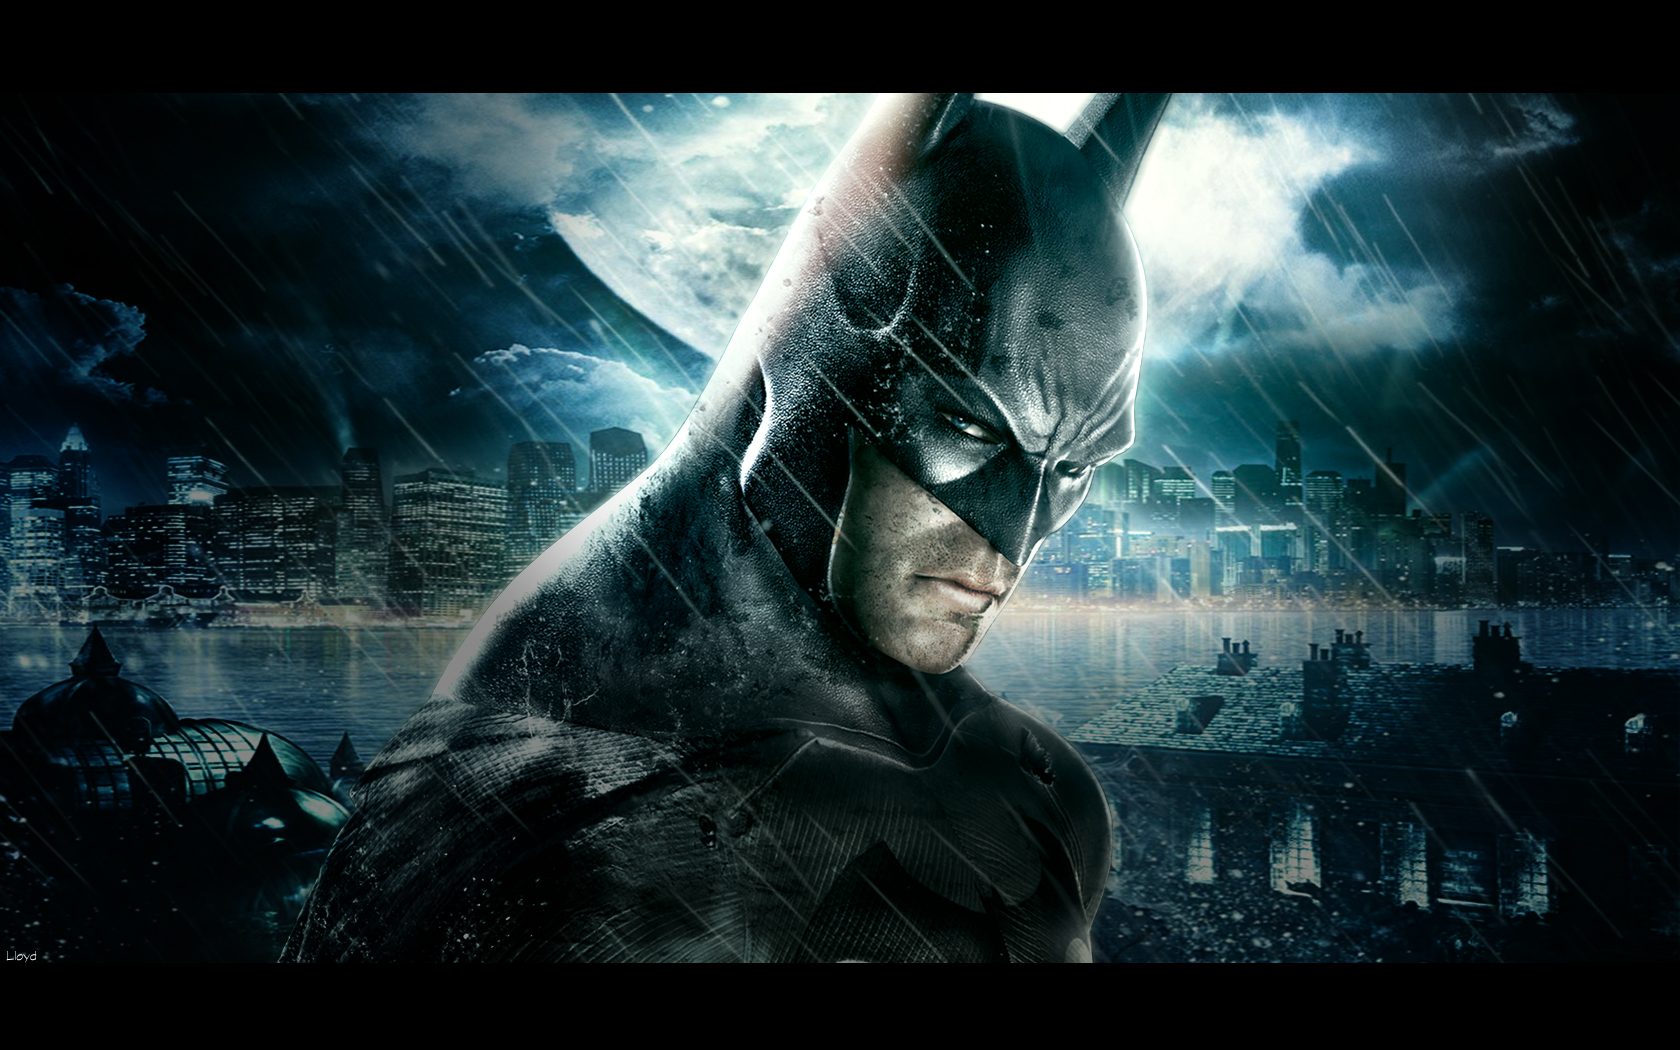 Batman:Arkham Asylum Wallpaper by igotgame1075